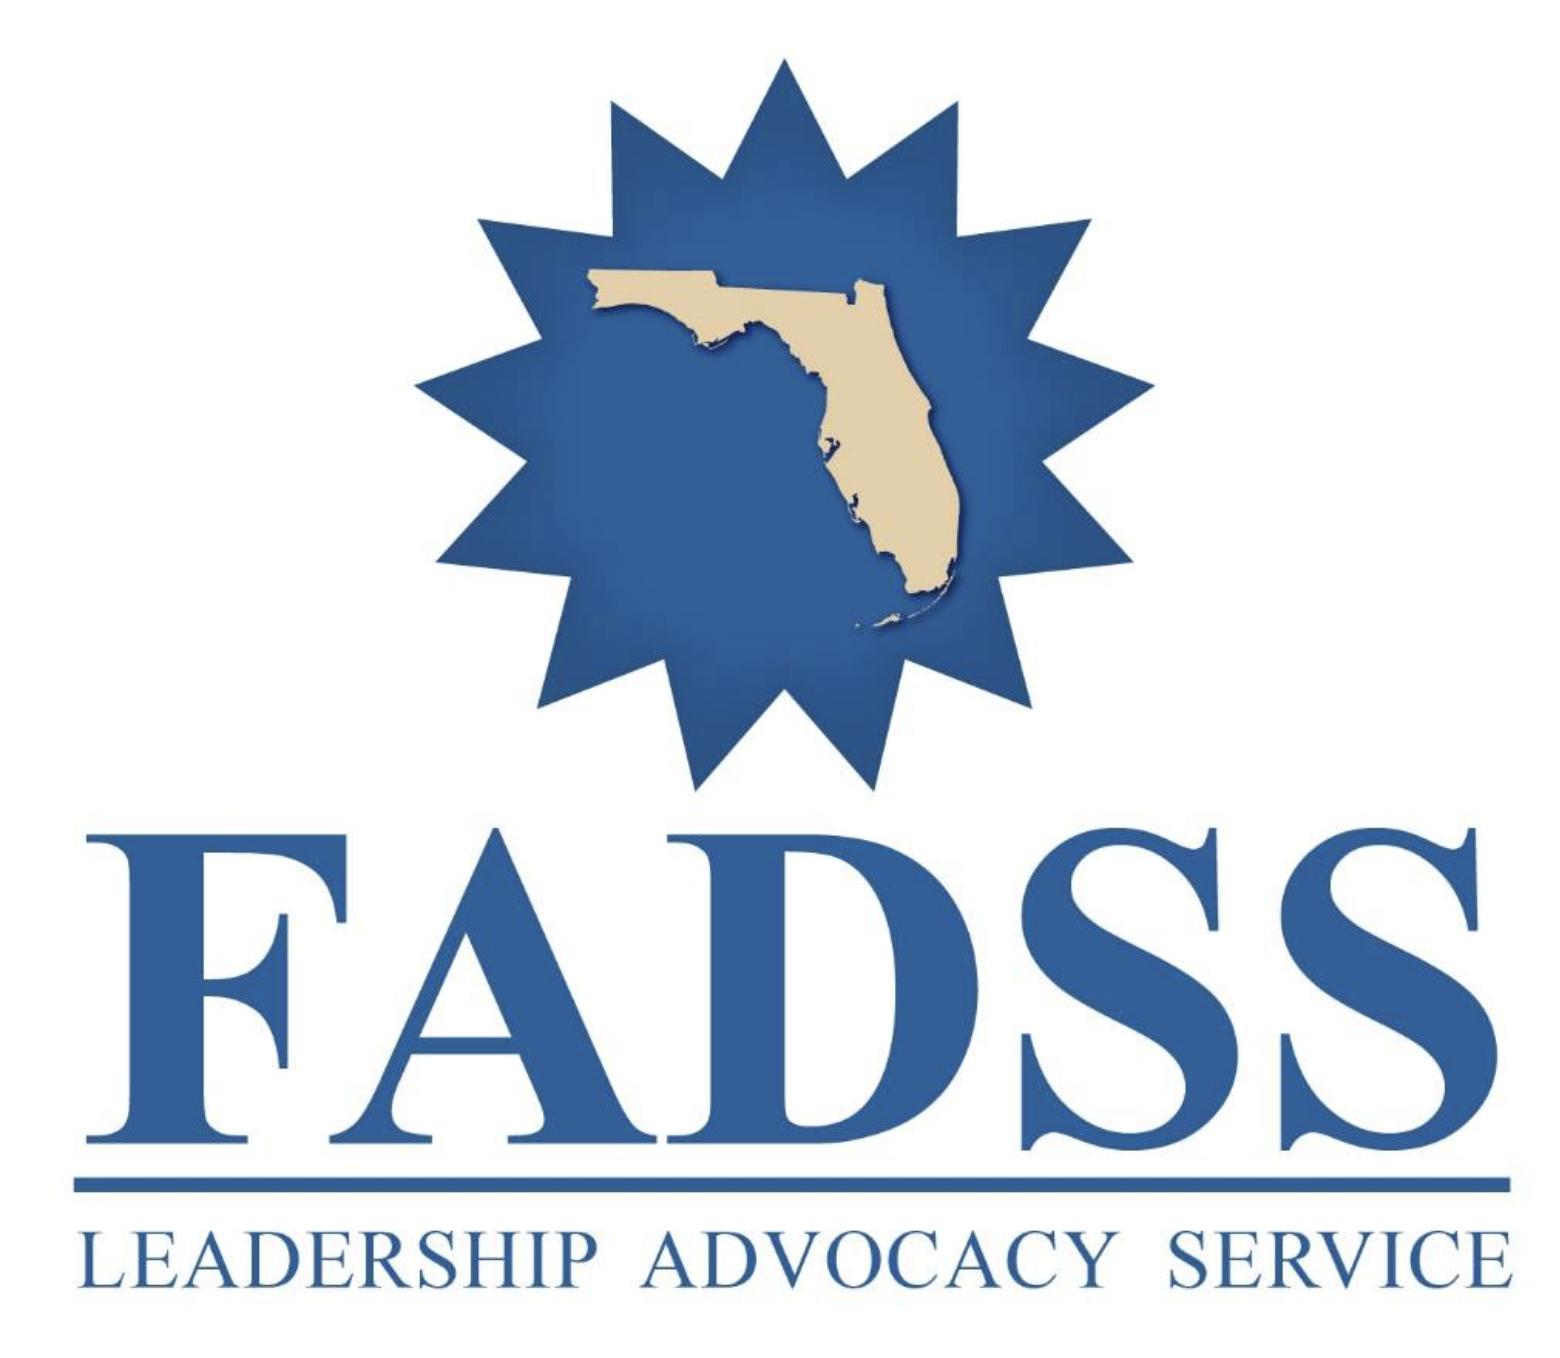 fadds-logo